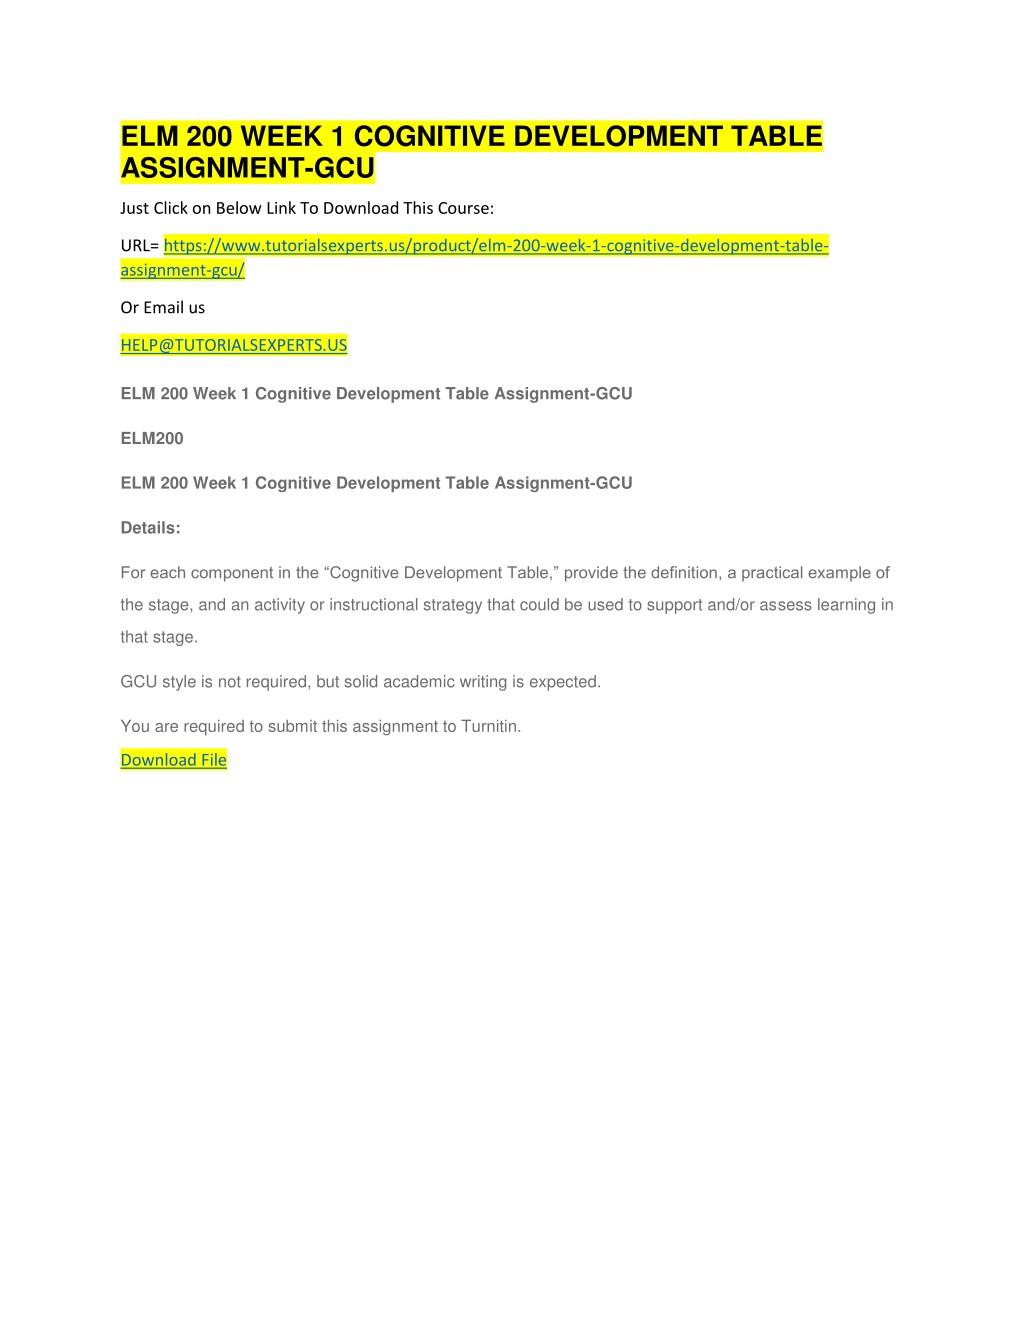 Ppt elm 200 week 4 powerpoint on language development-gcu.